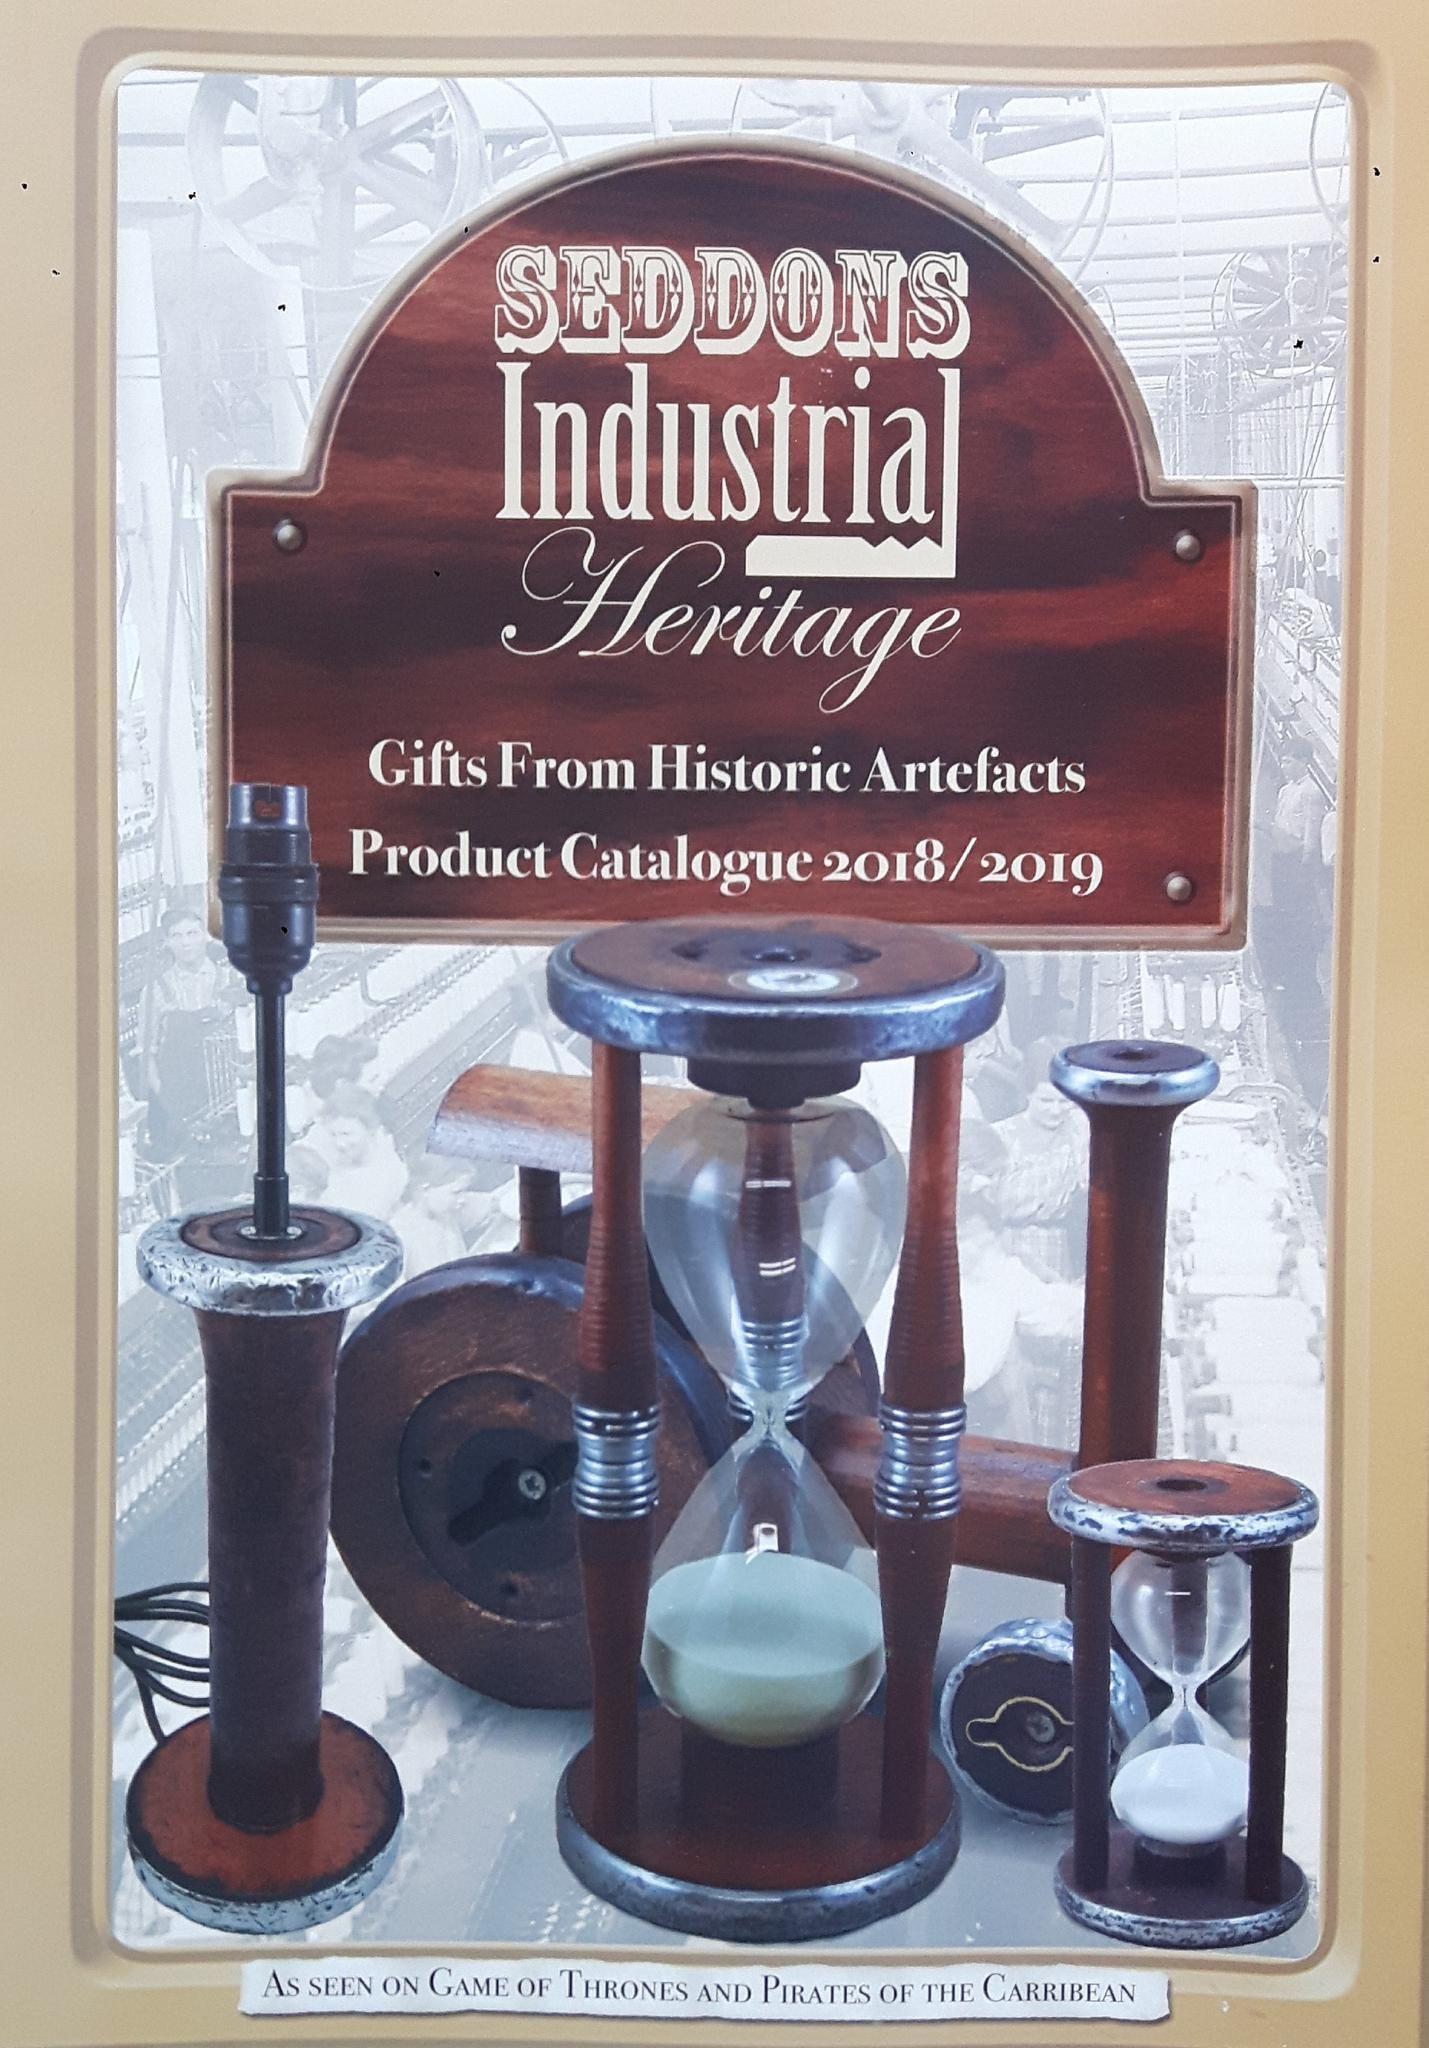 Seddons Industrial Heritage Ltd